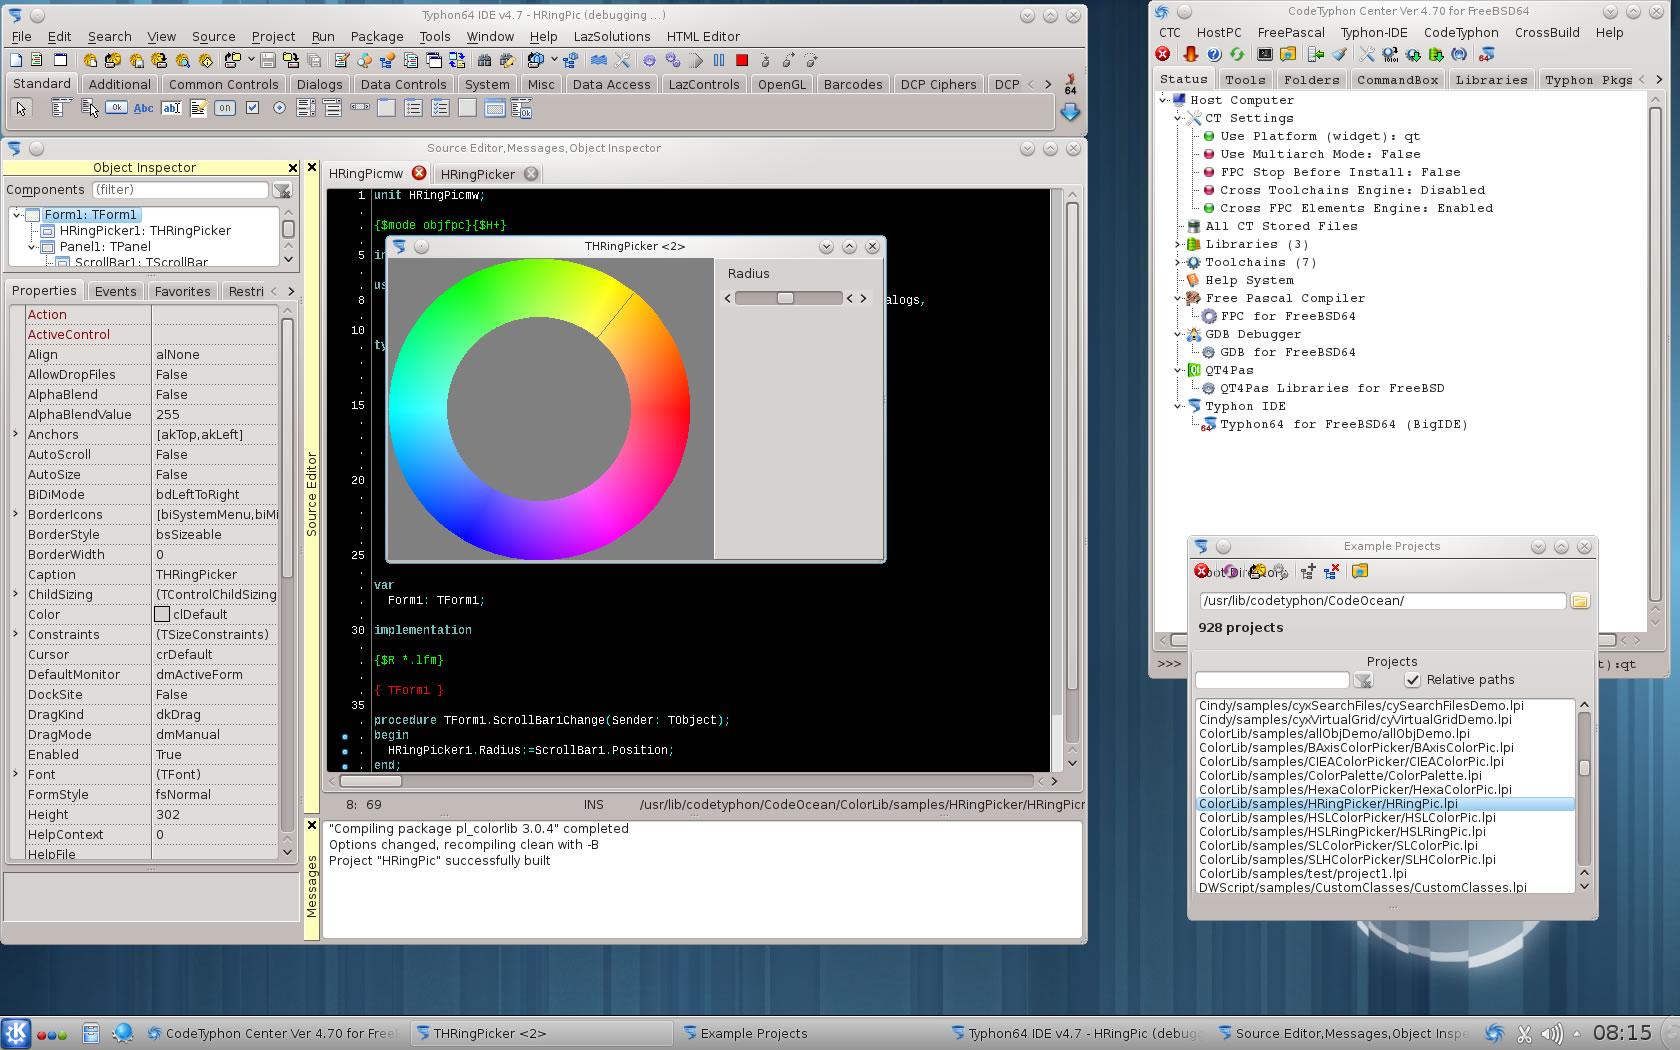 FreeBSD64-33.jpg